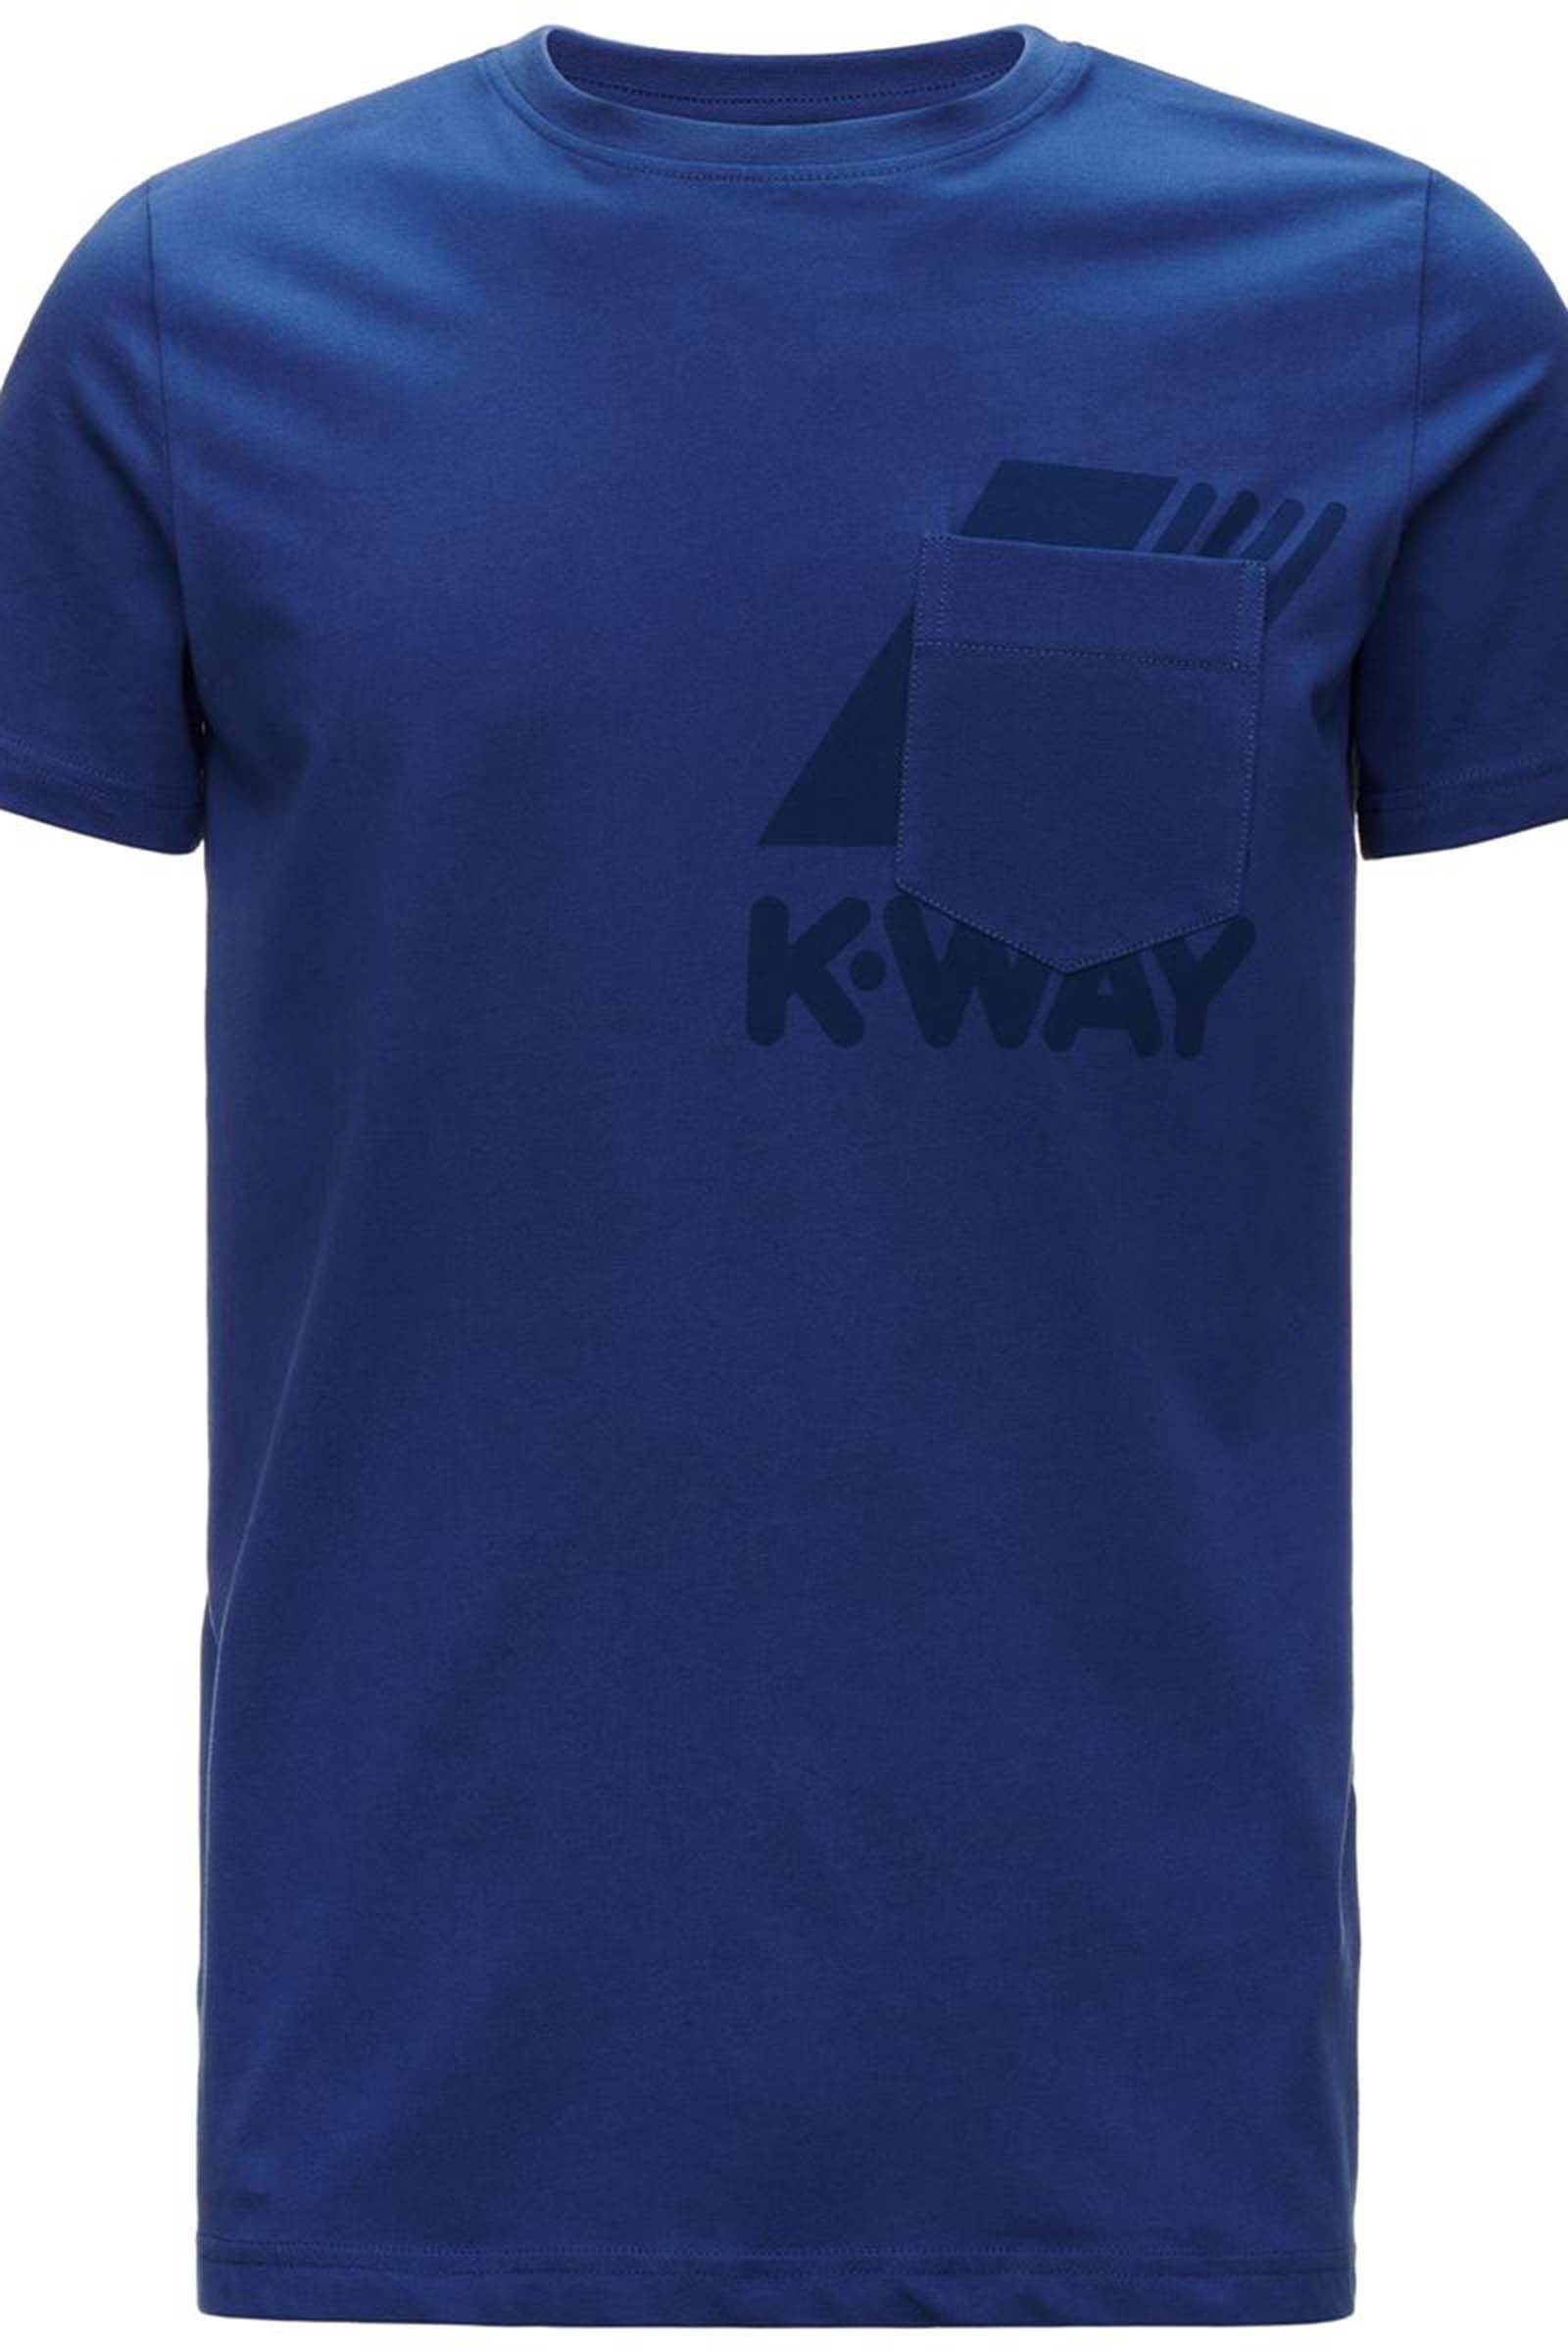 K-way T-shirt Uomo K51121W379  -19